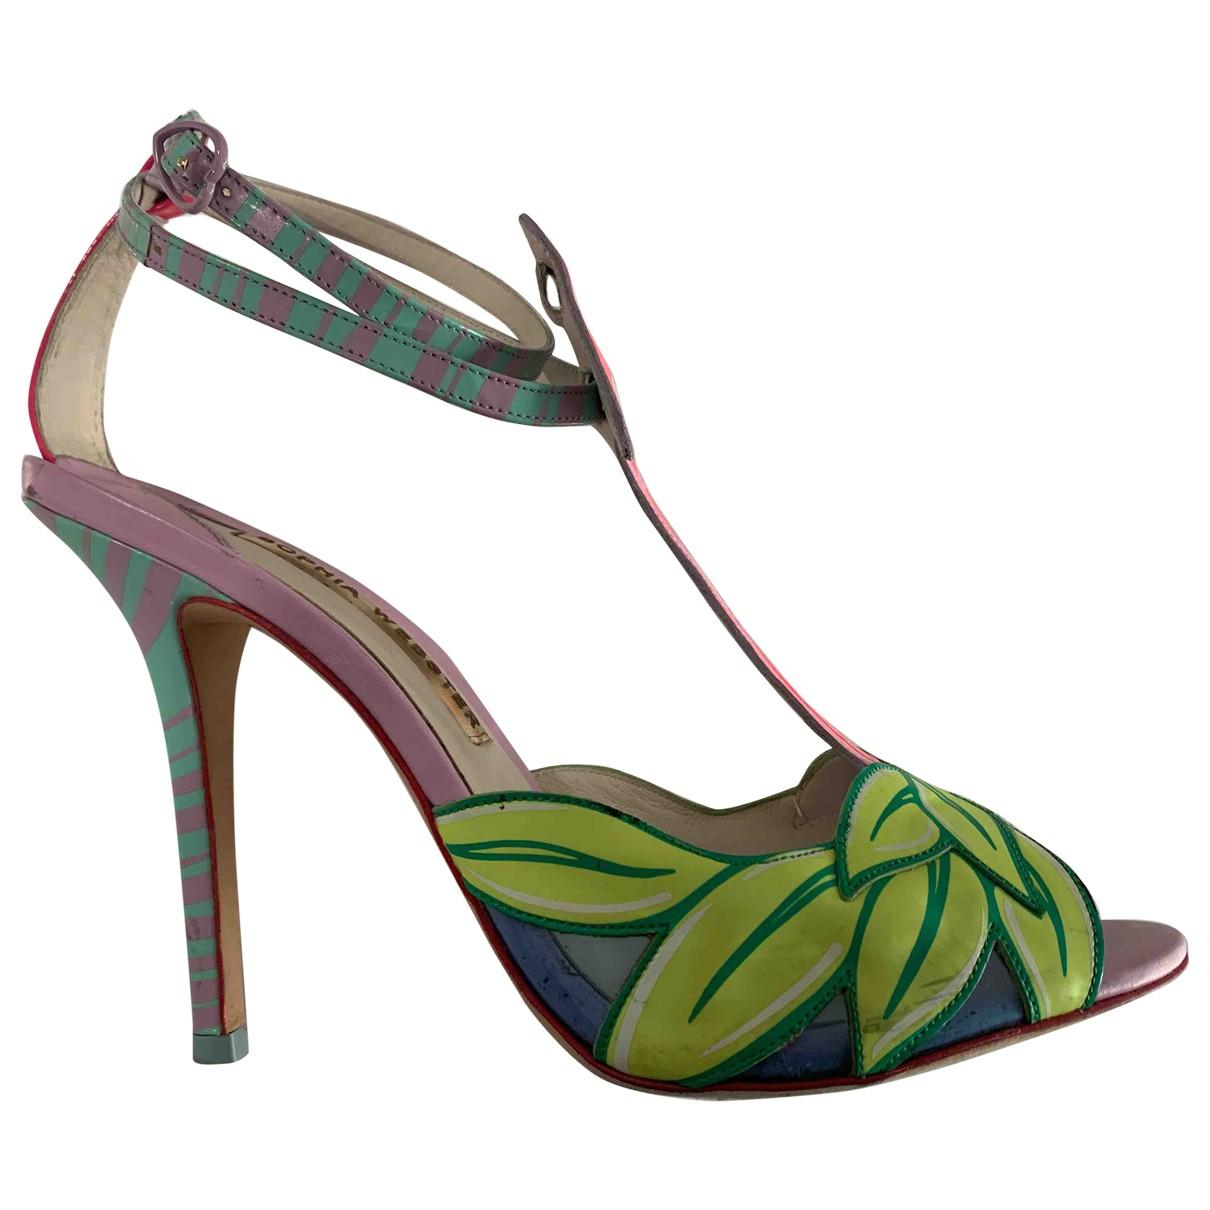 Sophia Webster - Escarpins   pour femme en cuir verni - multicolore